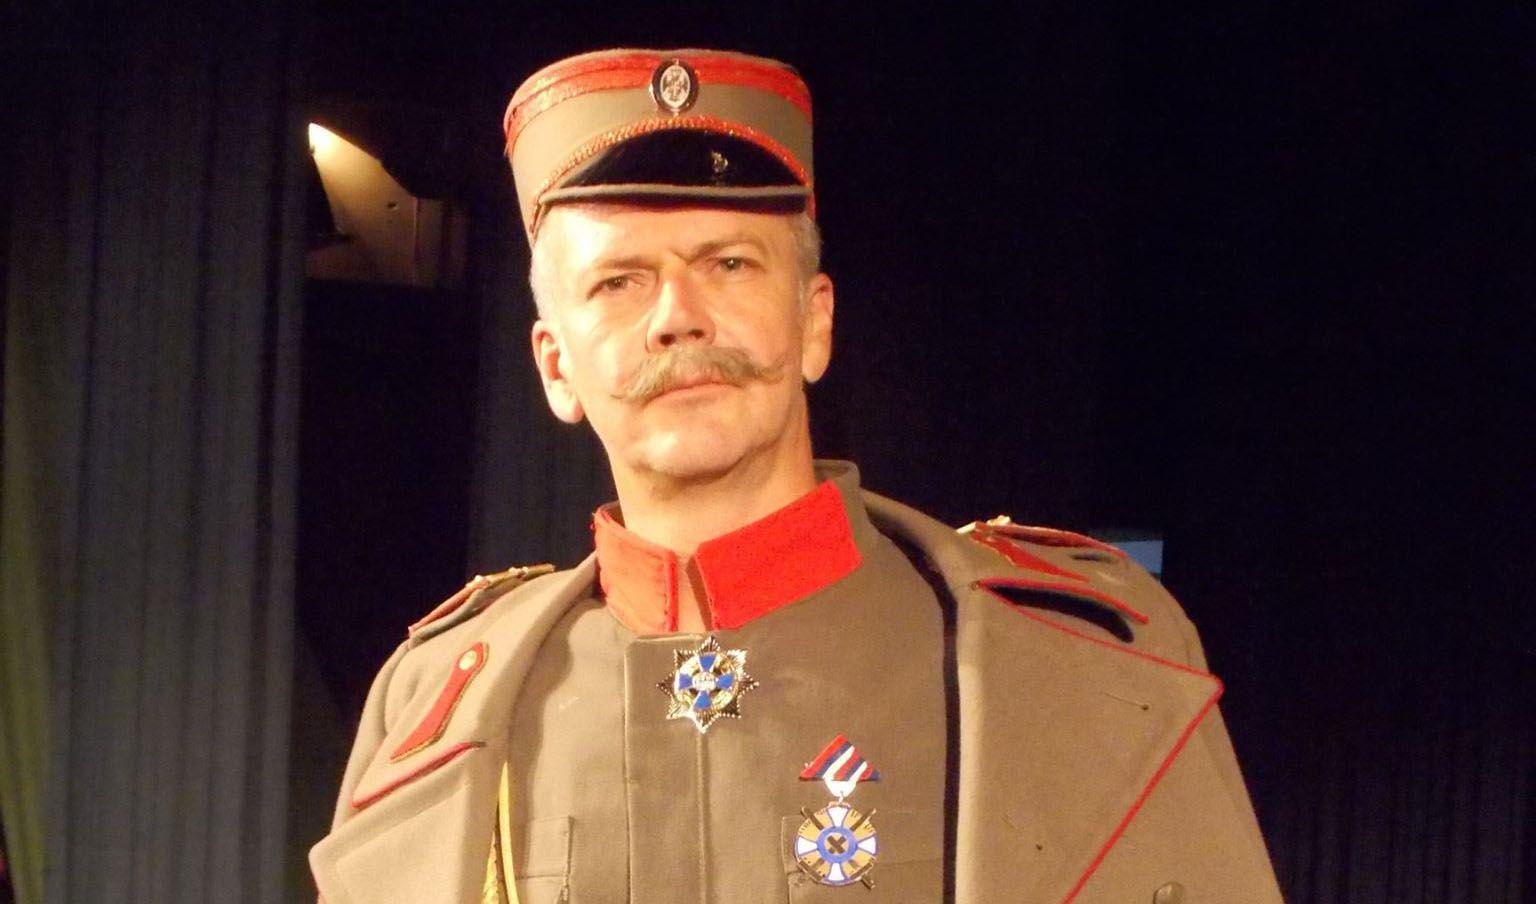 Predstava o vojvodi Petru Bojovicu